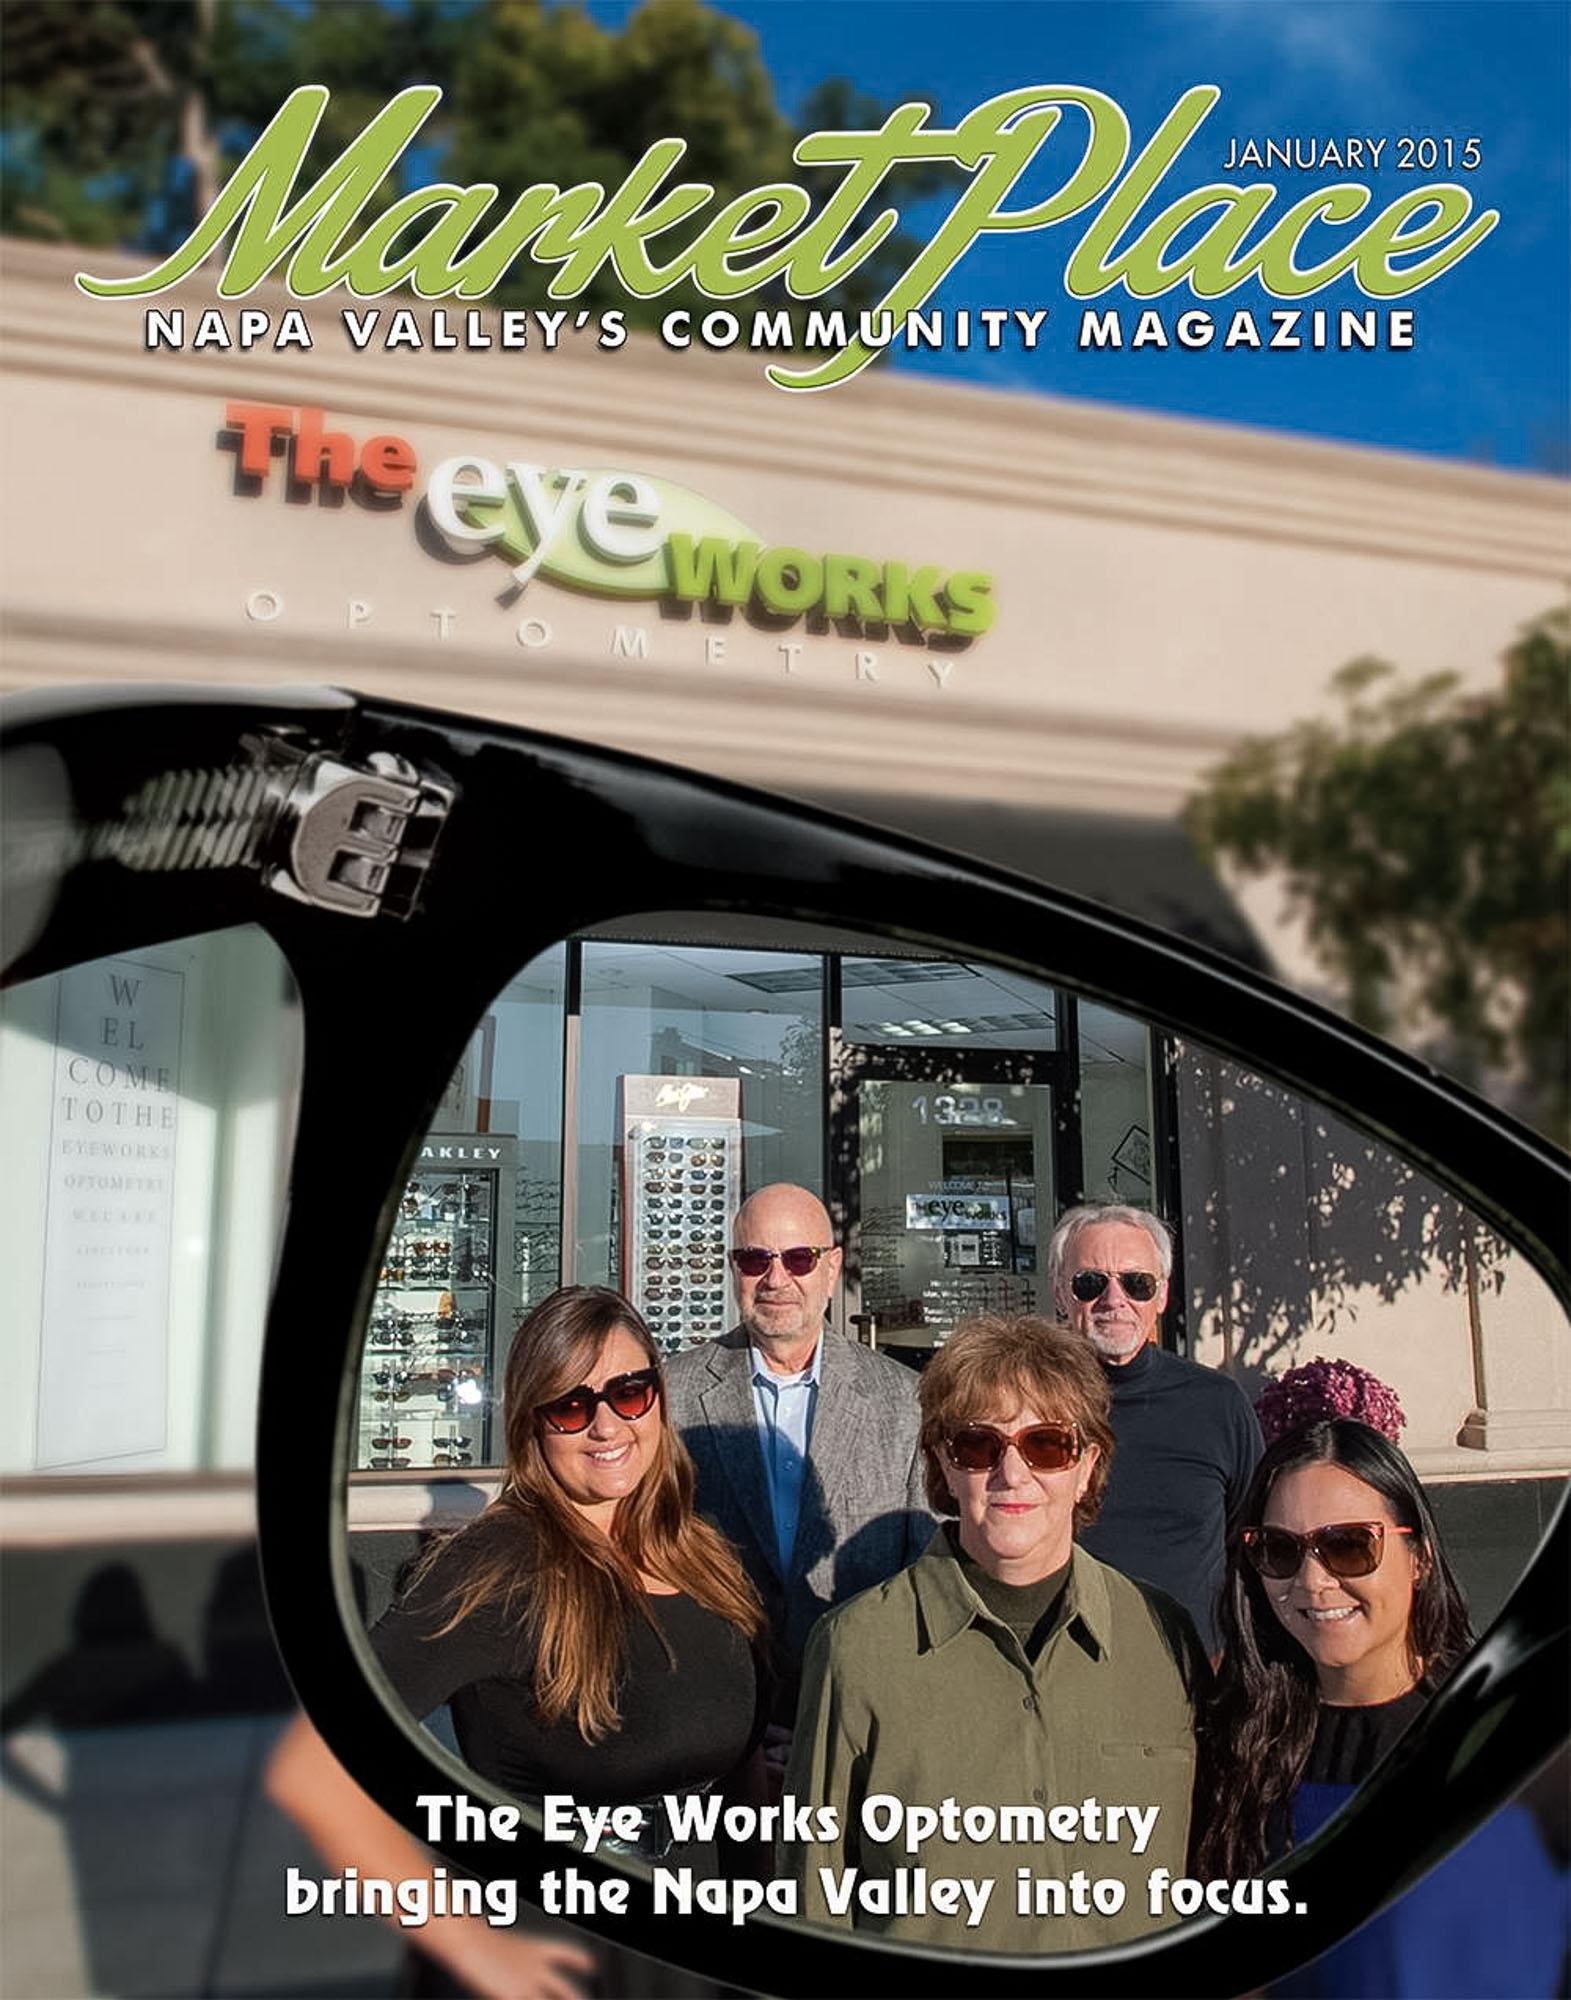 2014-EyeWorks-MP_cover final-MP-2.jpg